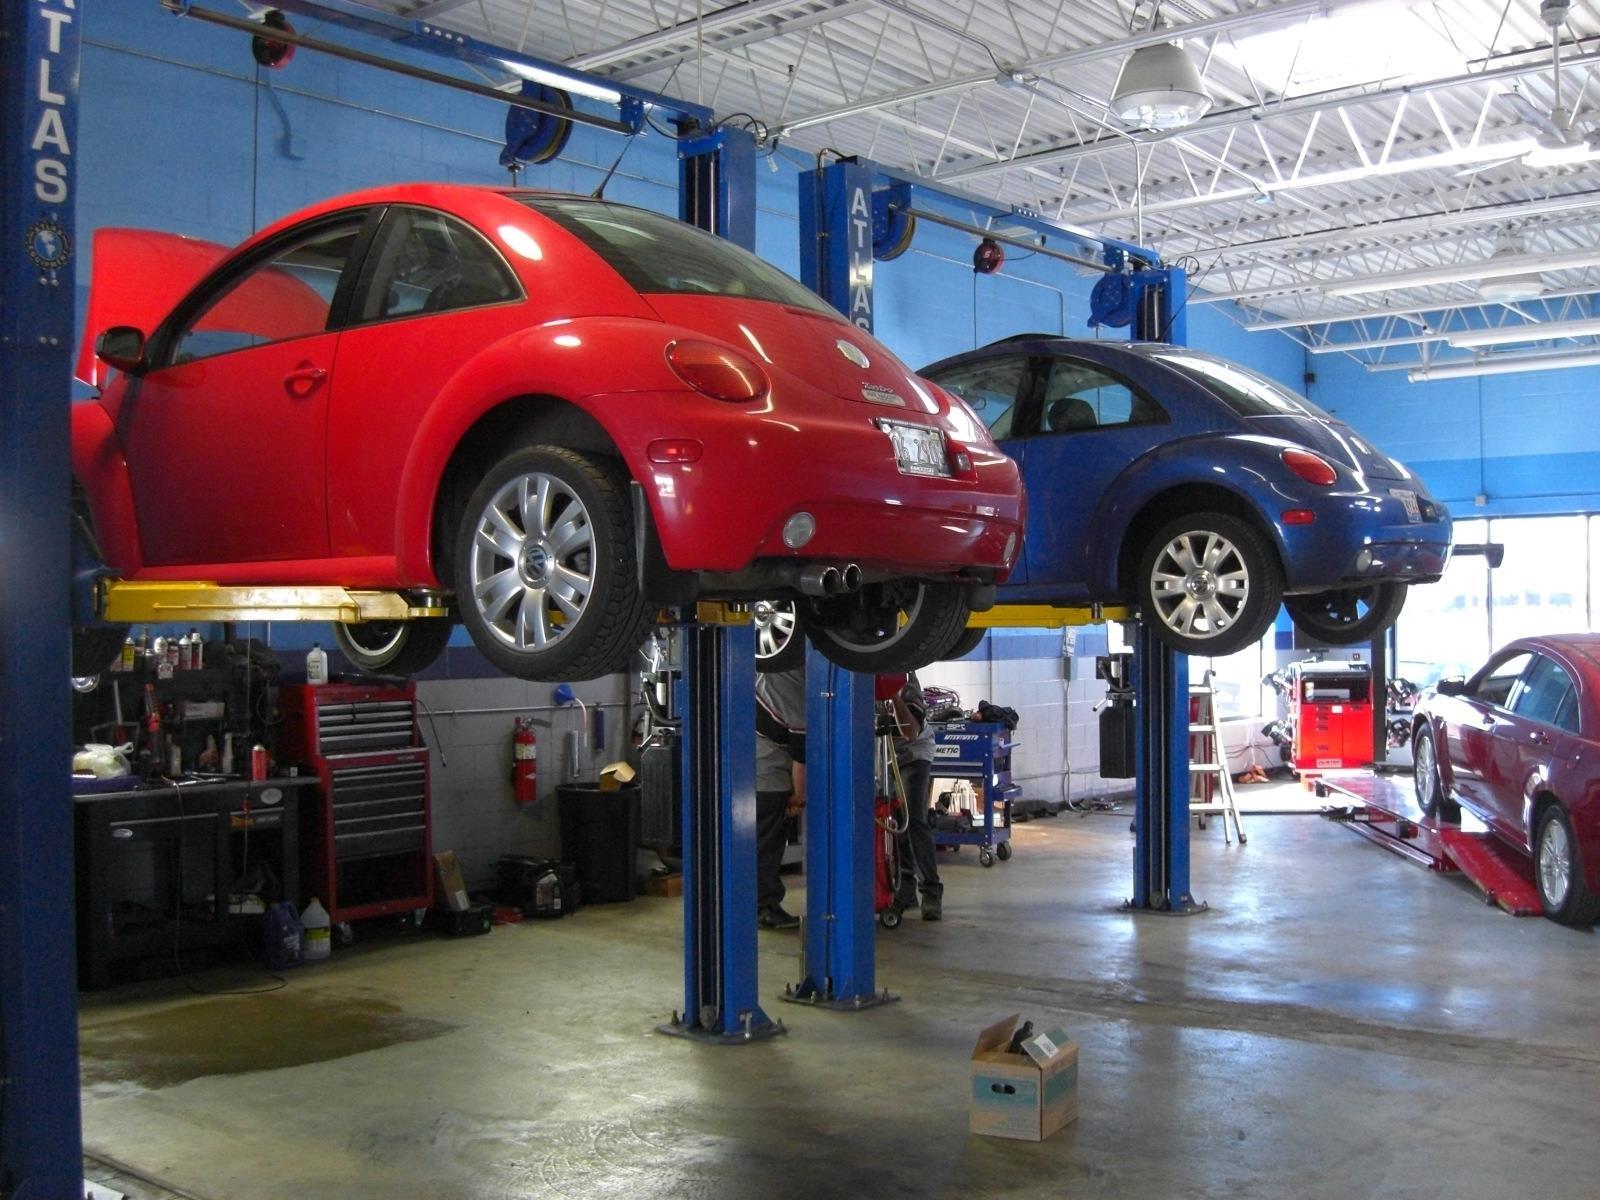 Car Craft Advanced Orland Park Illinois Il